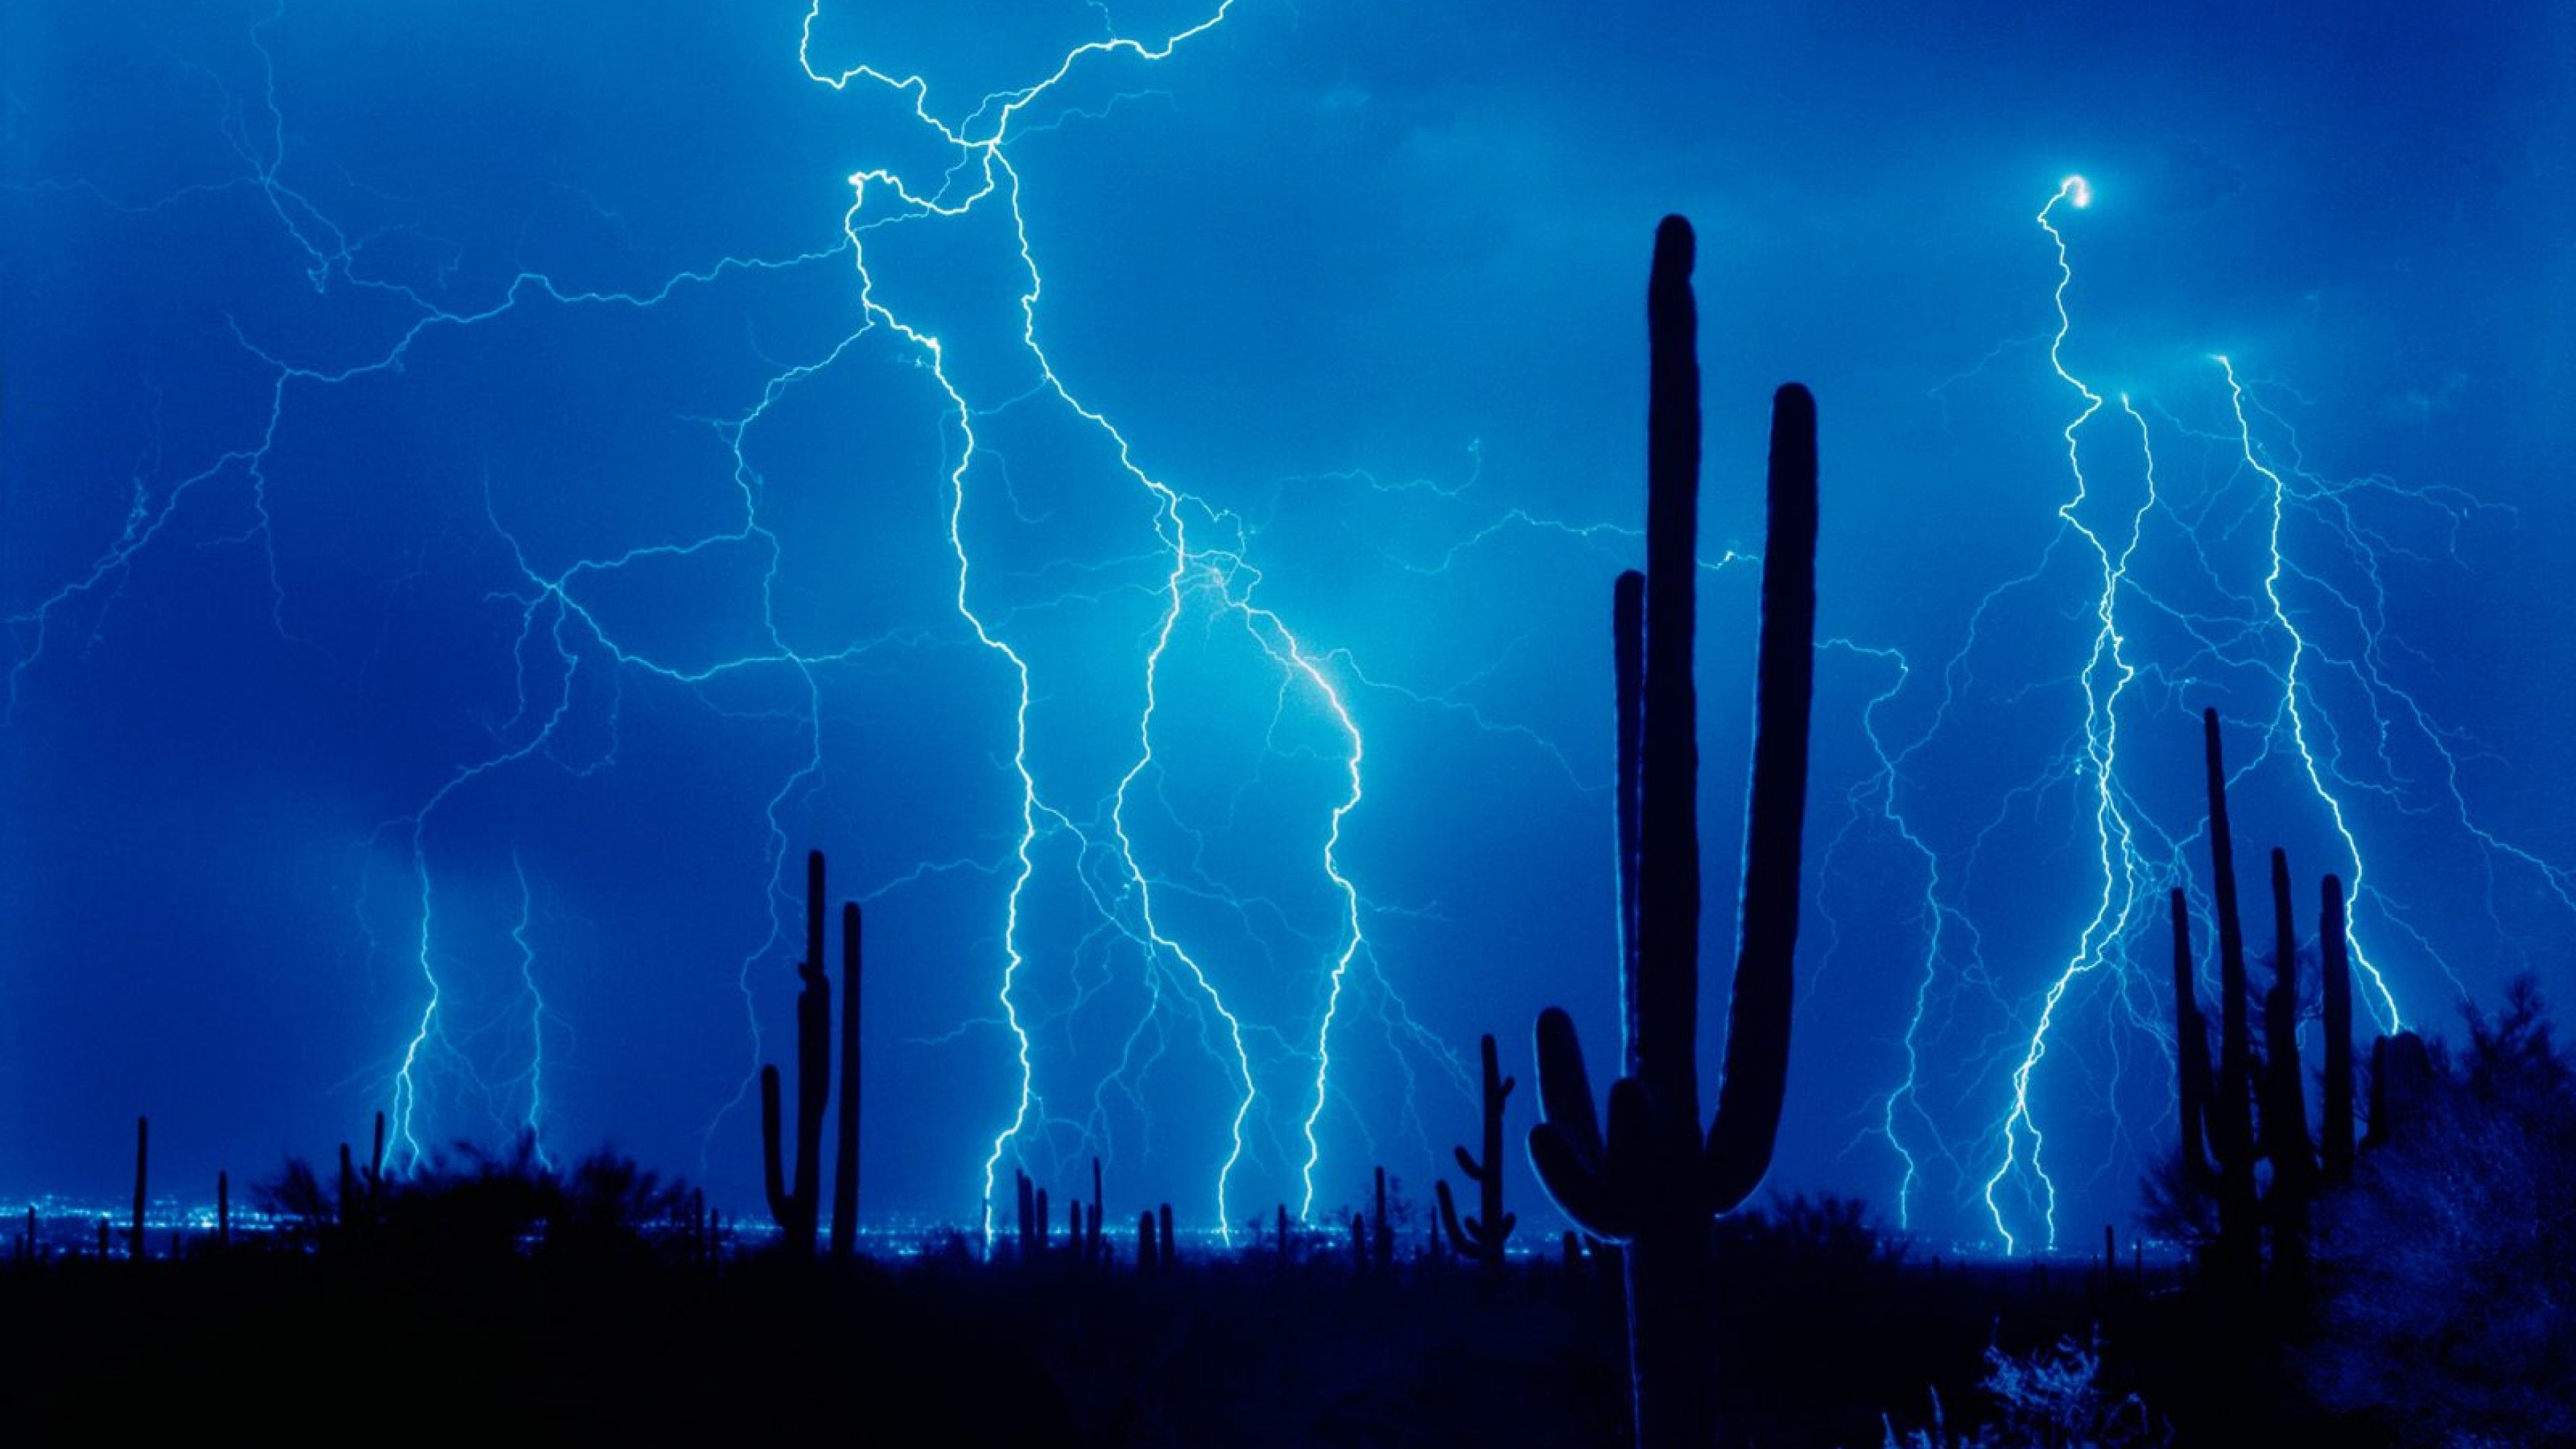 Download Wallpaper Lightning, Thunder-storm, Elements .